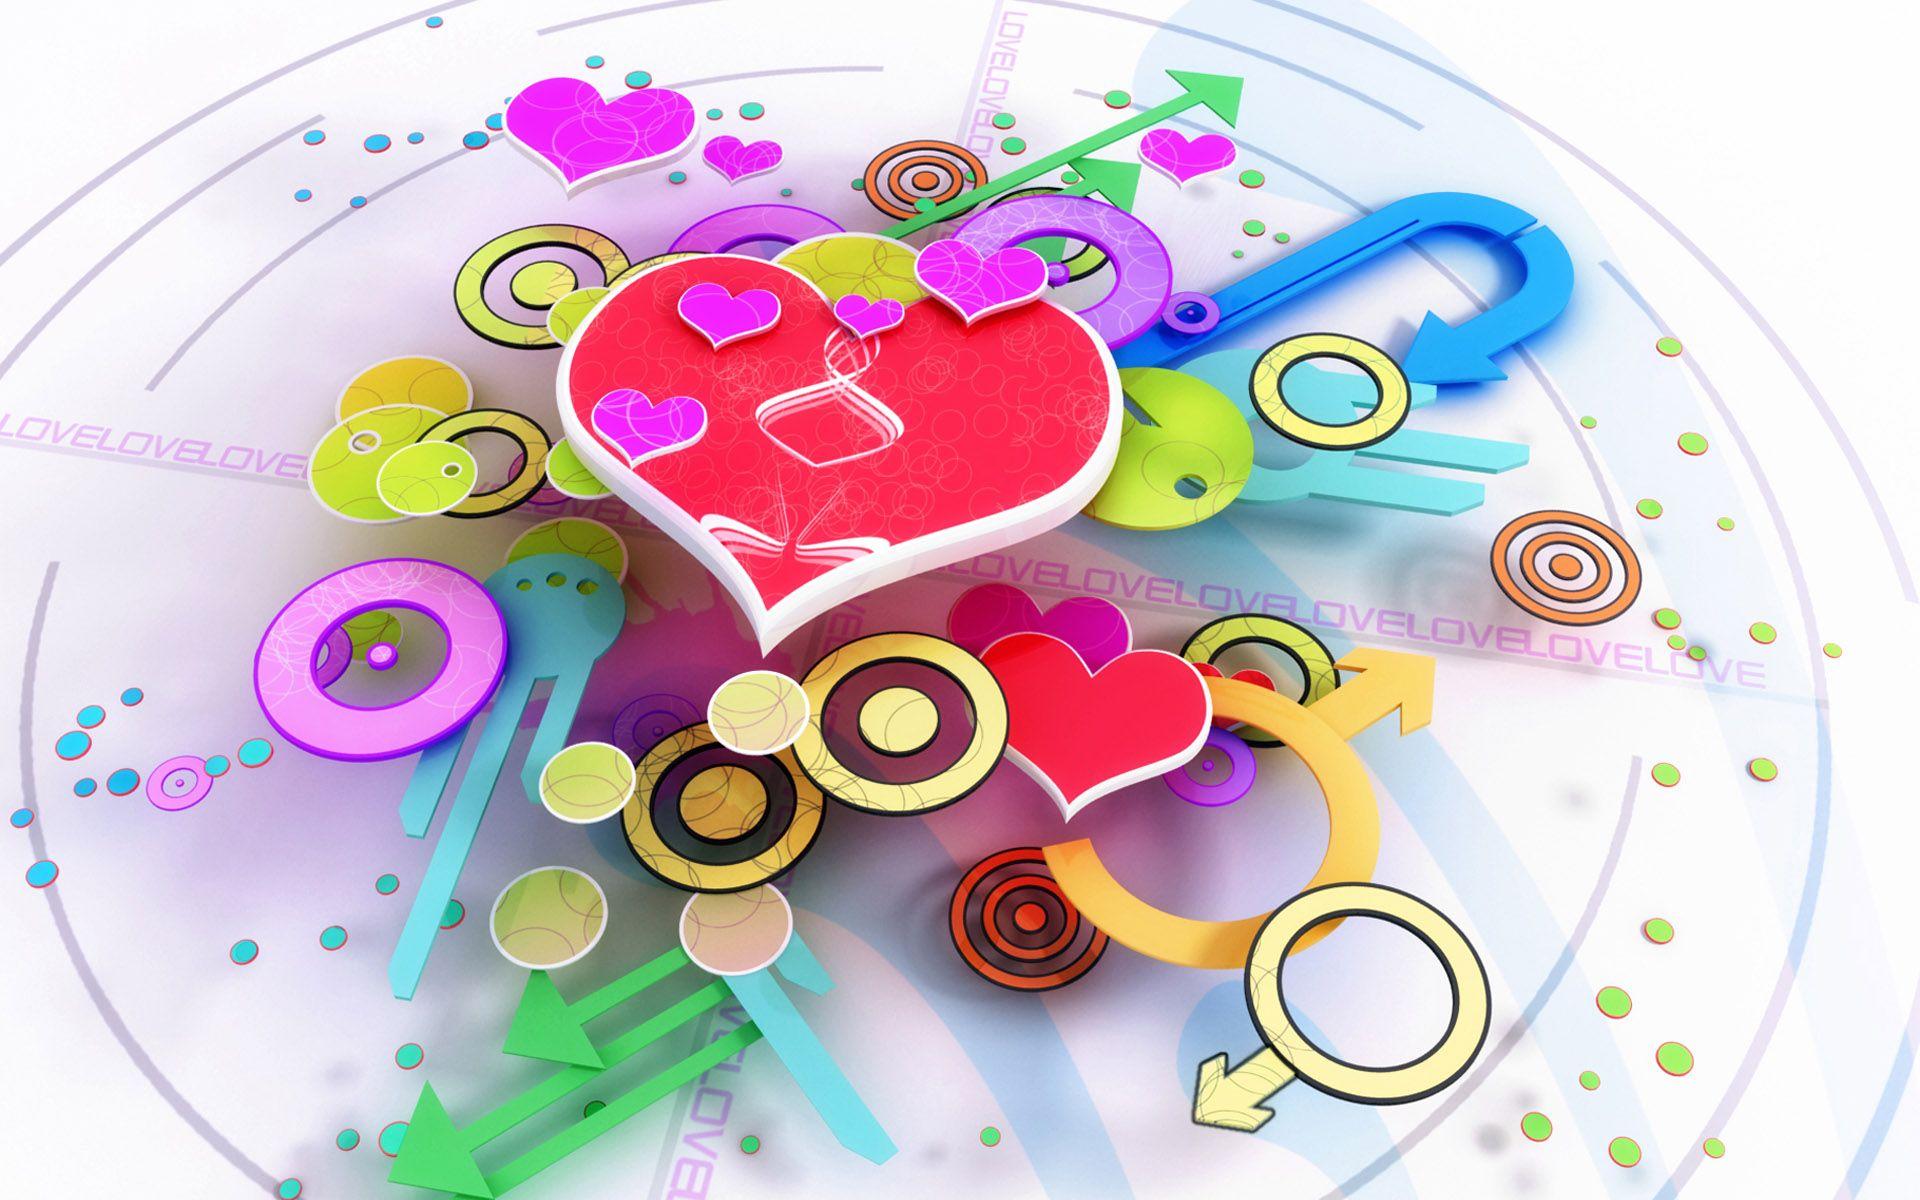 Hd Abstract Wallpapers Valentines Wallpaper Heart Wallpaper Iphone Wallpaper